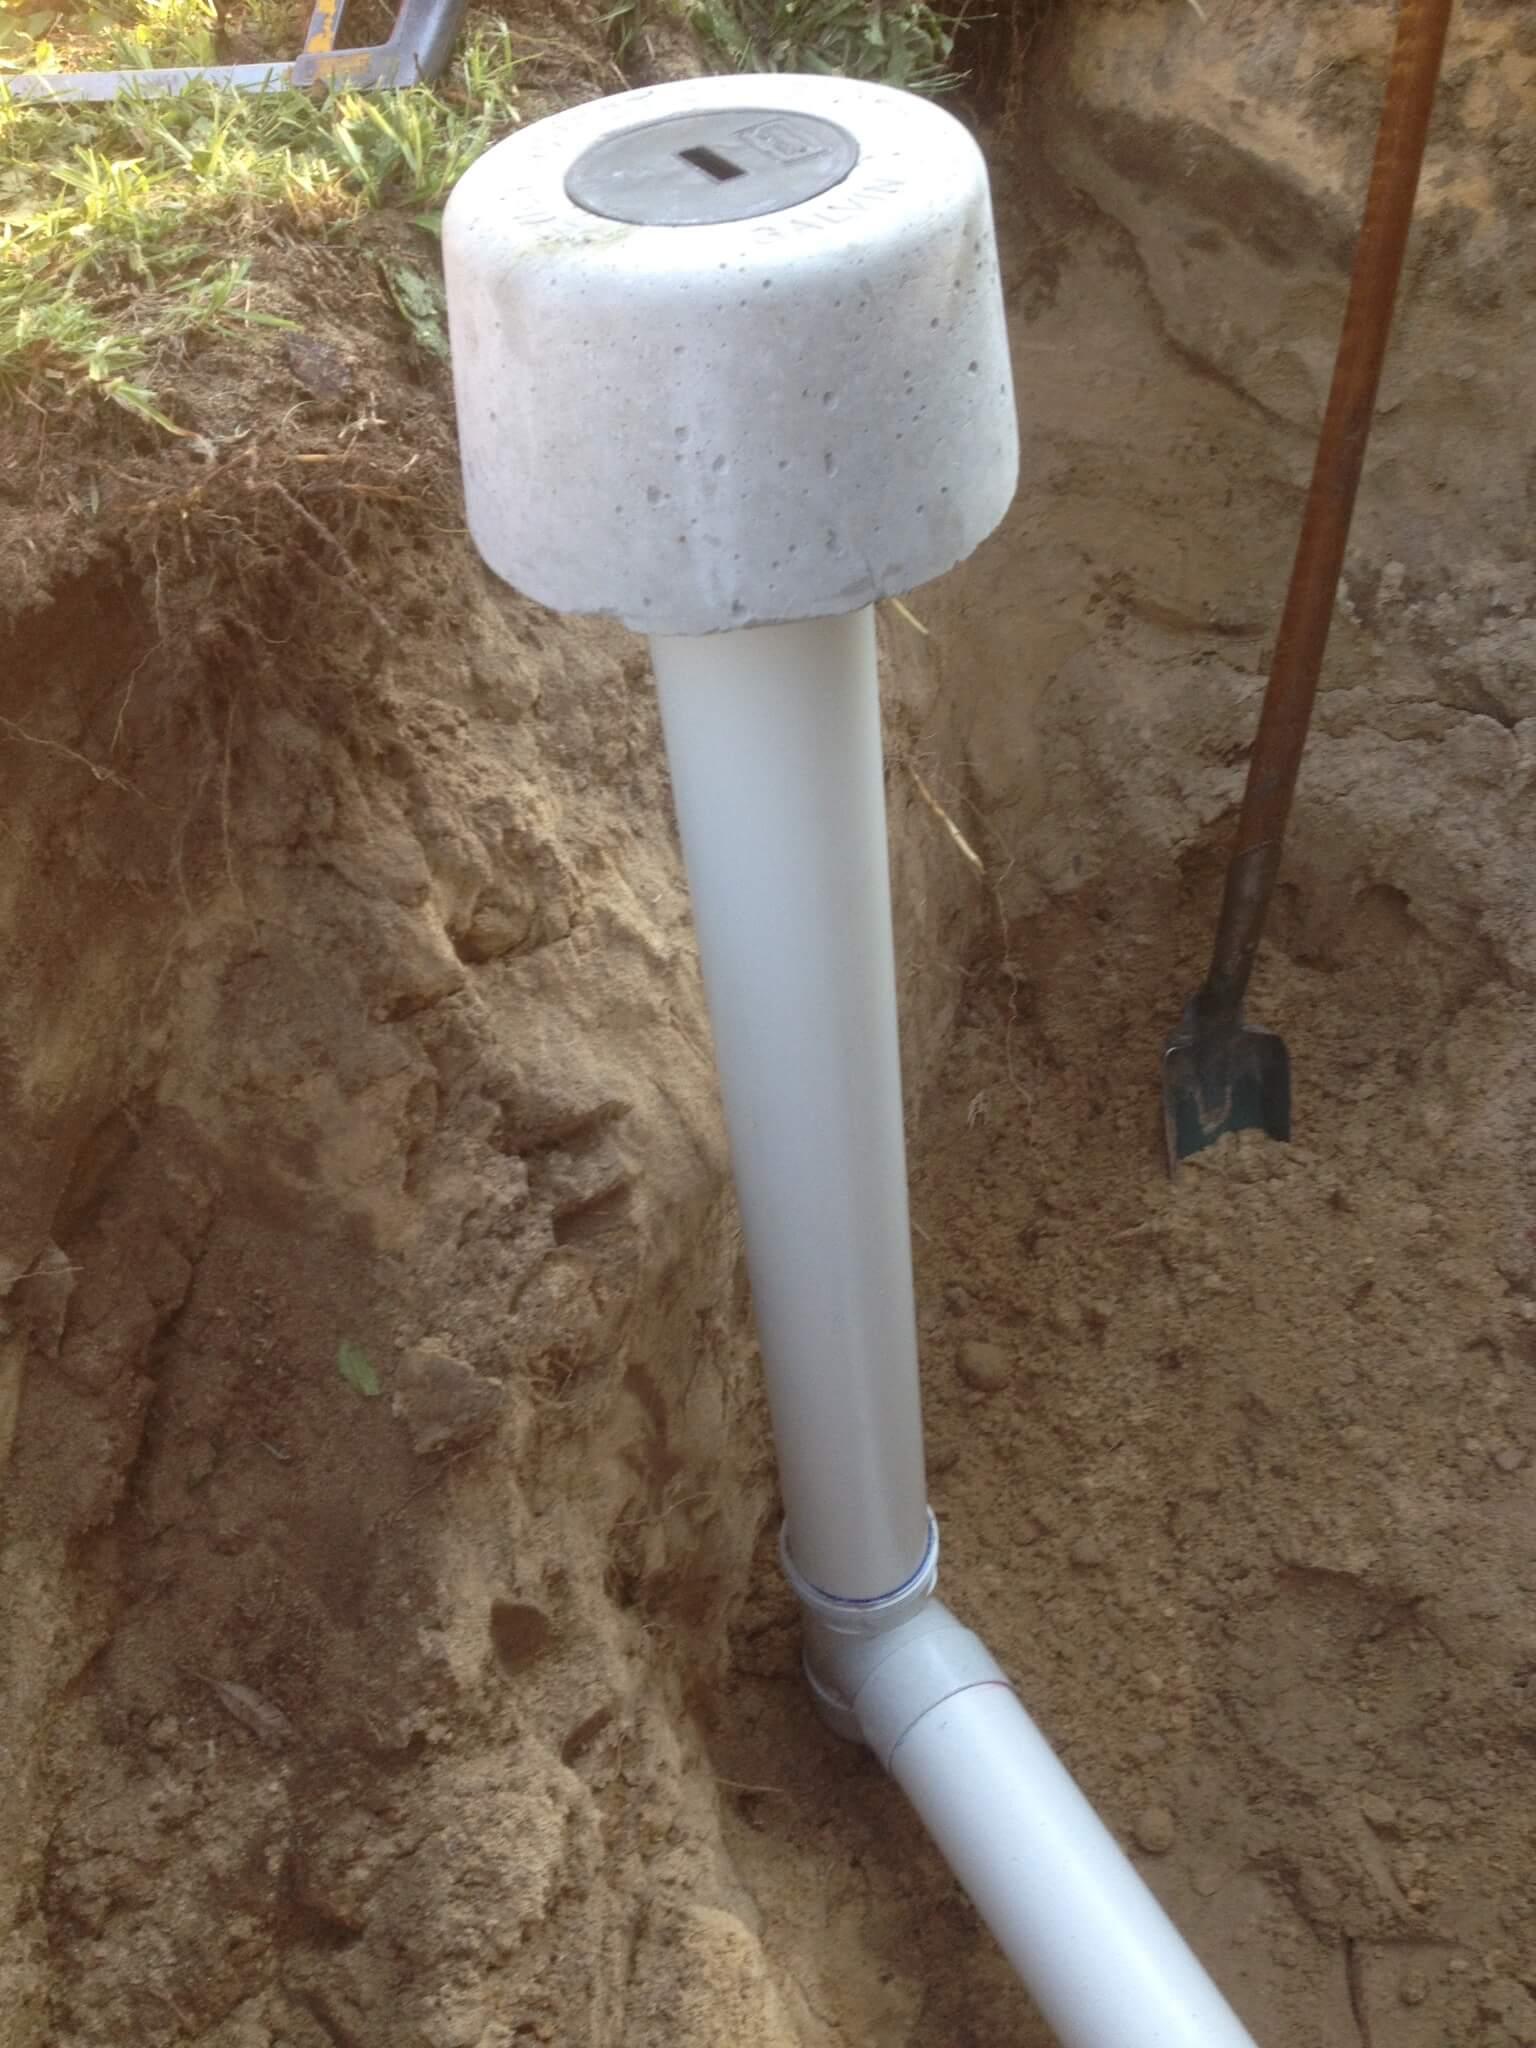 Everyday Plumbers Residential Blocked Drains Plumber - White Pump 2333